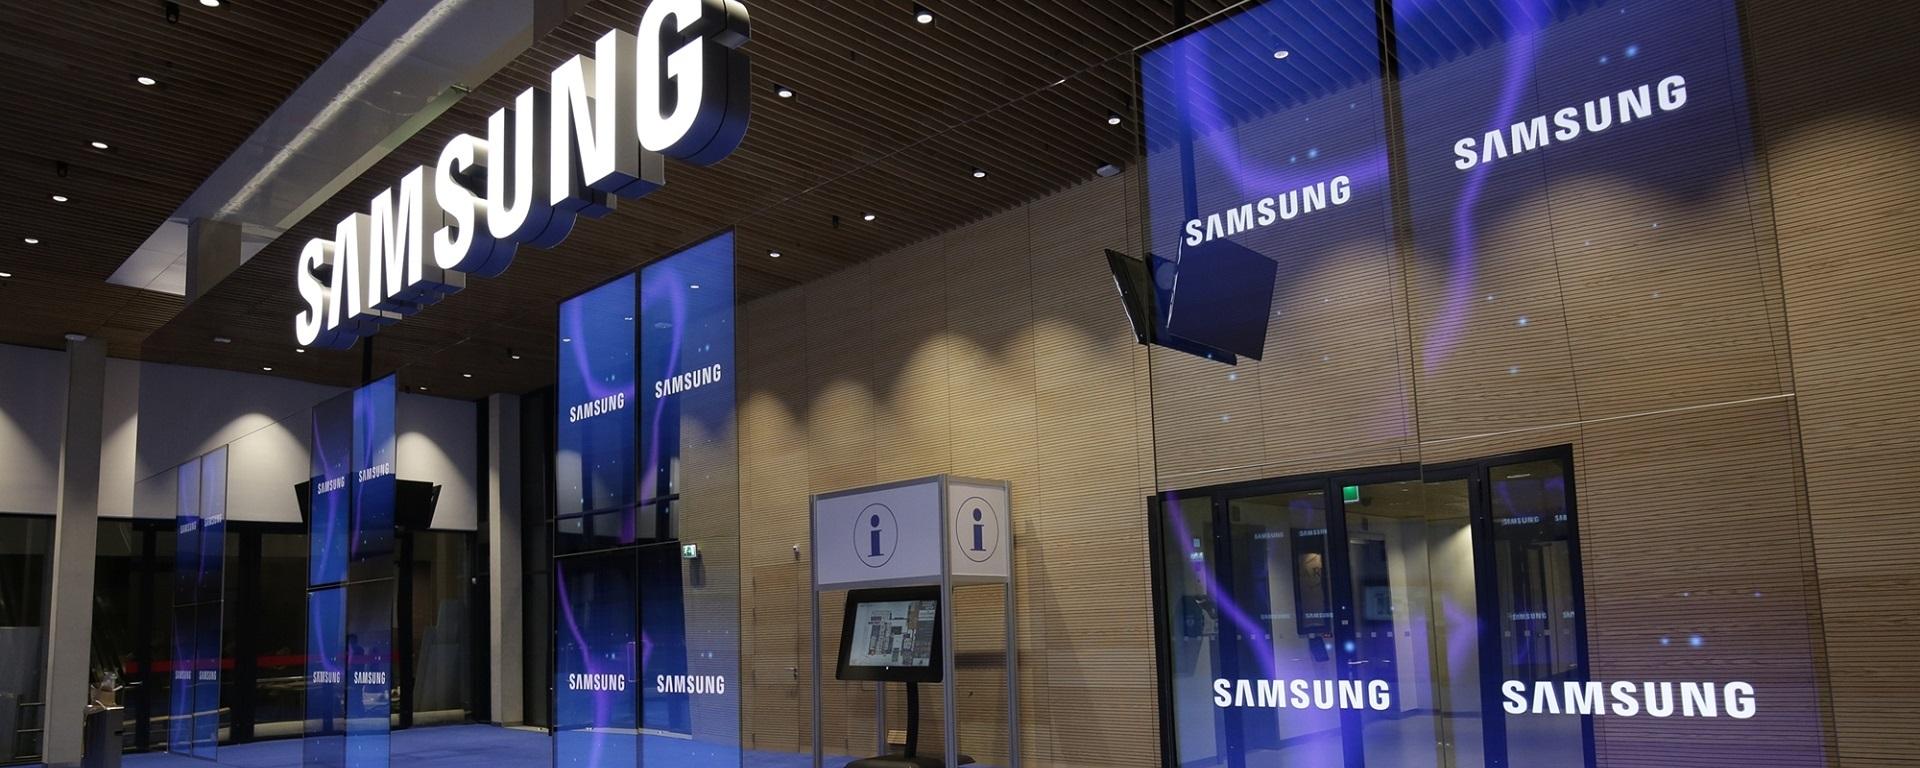 Digital Signage Trends Samsung Business Insights